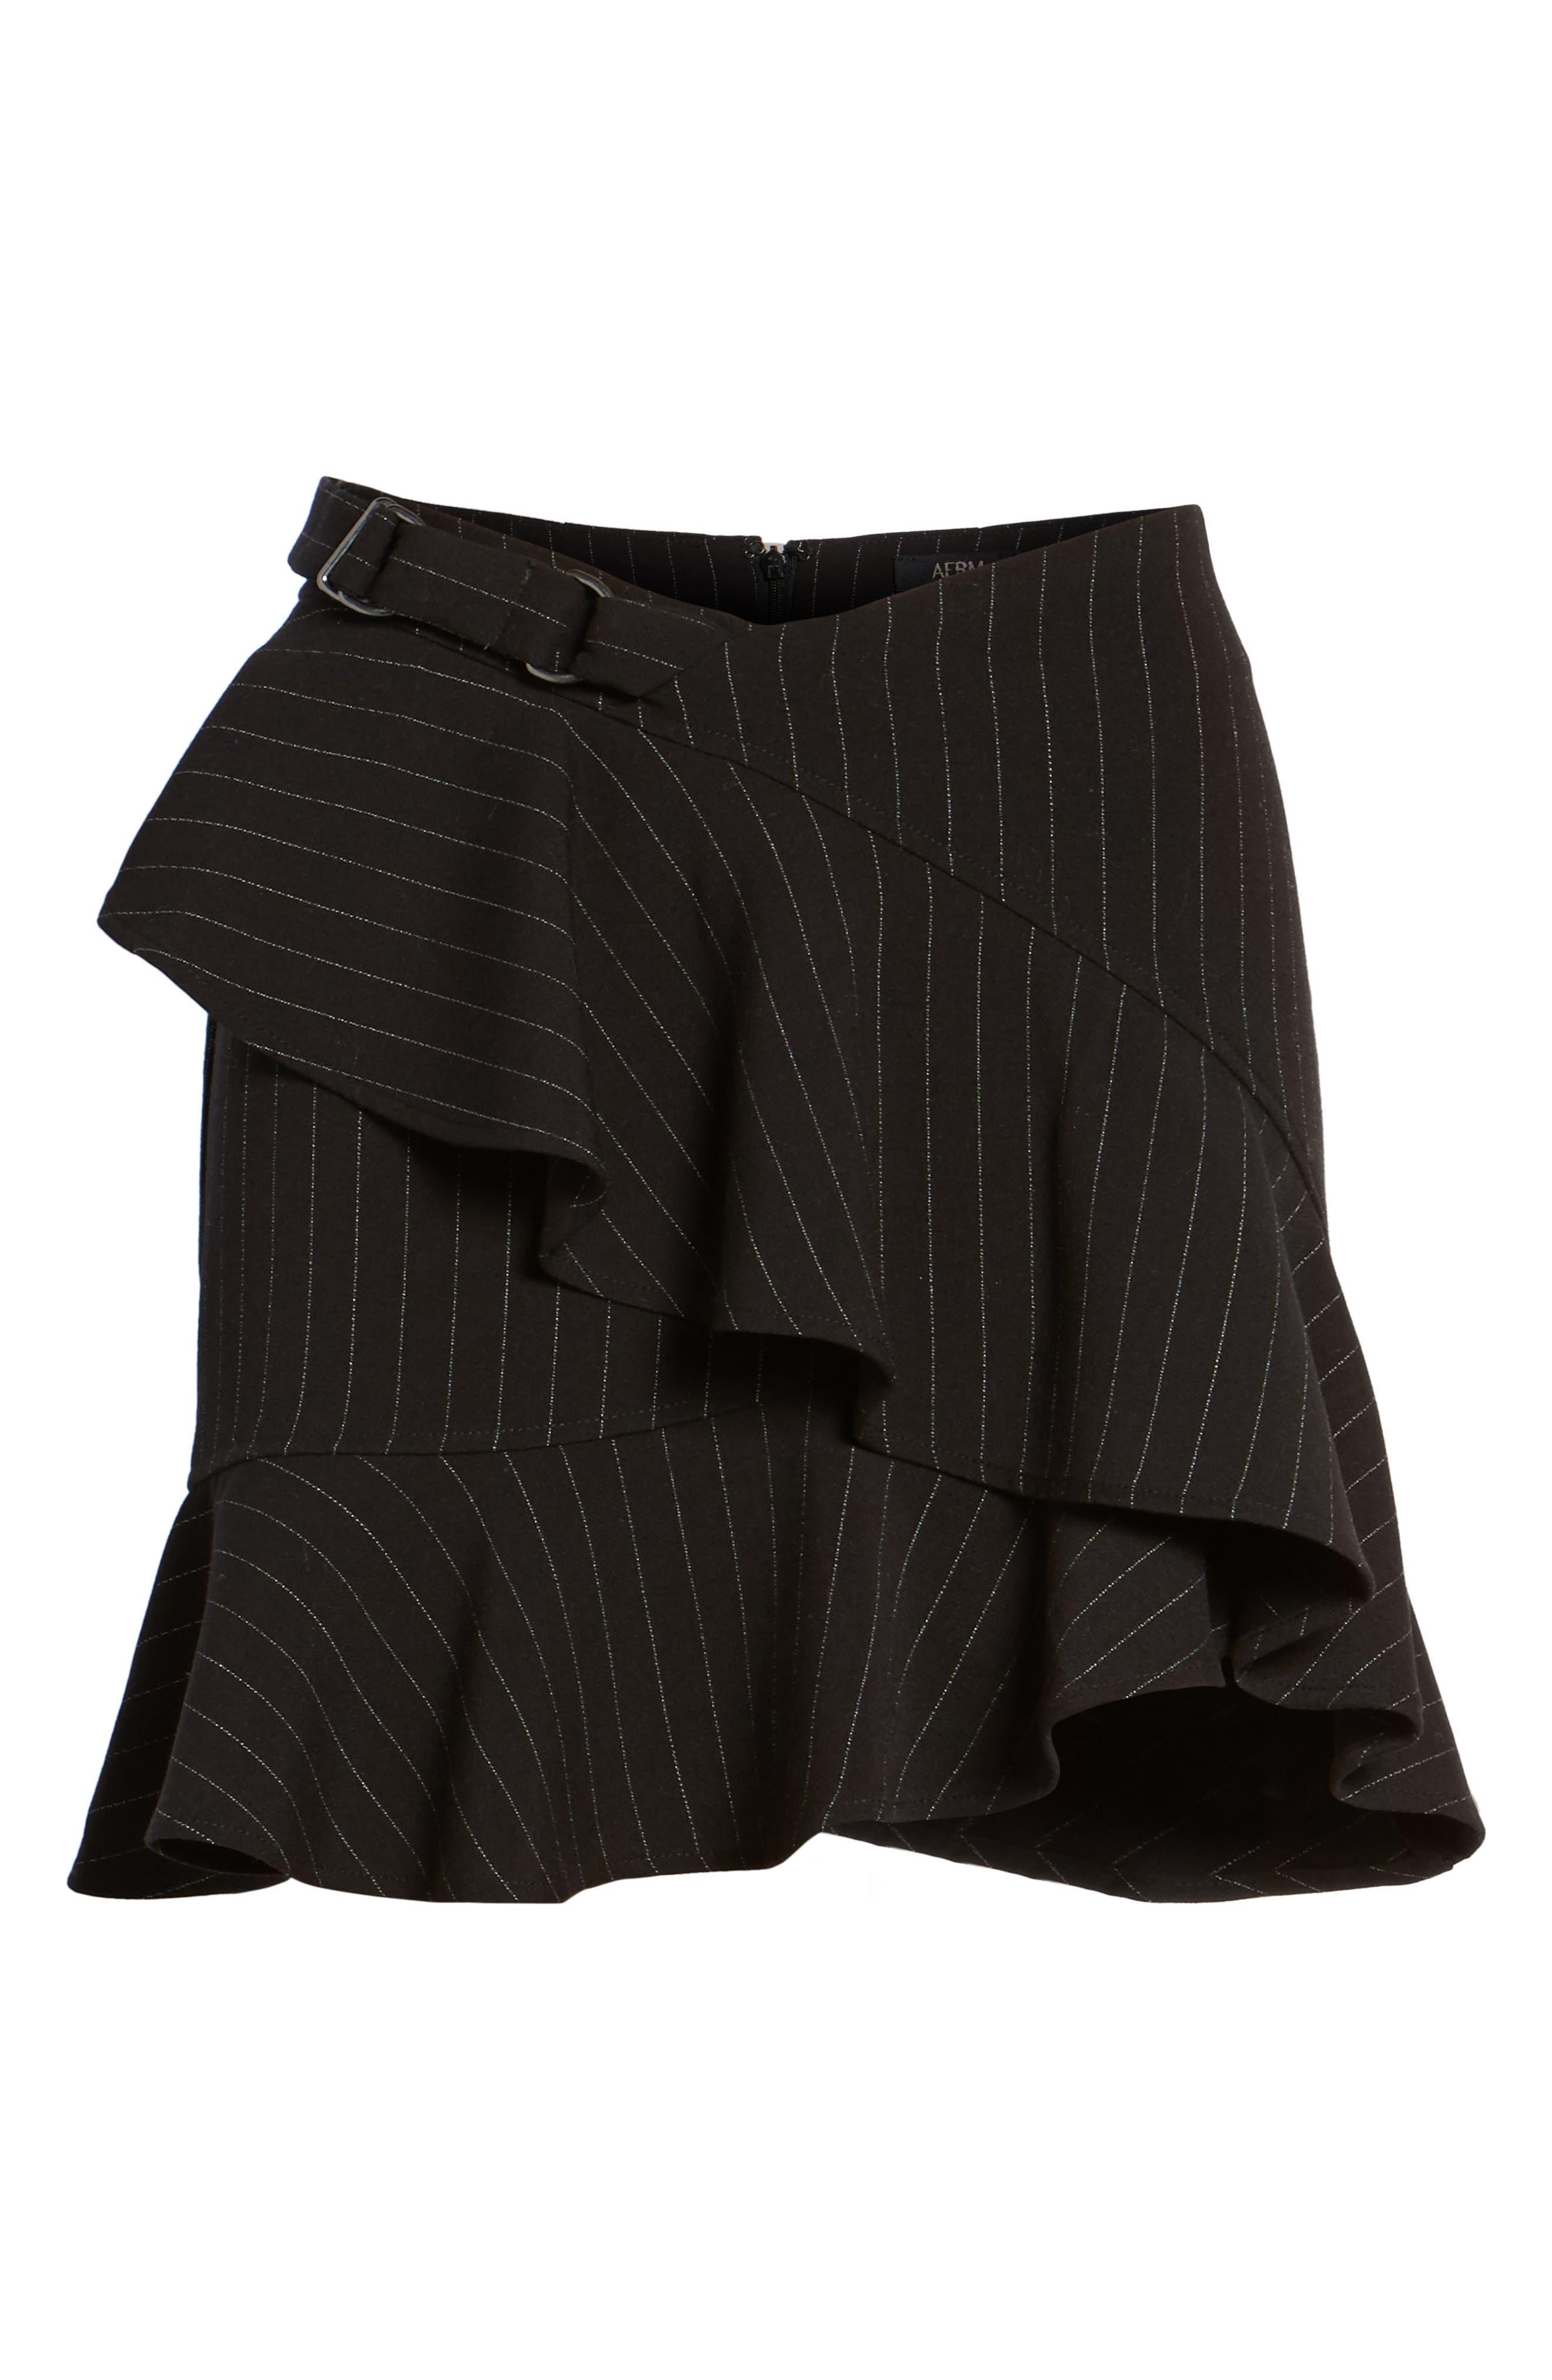 Dominic Asymmetrical Ruffle Skirt,                             Alternate thumbnail 6, color,                             001